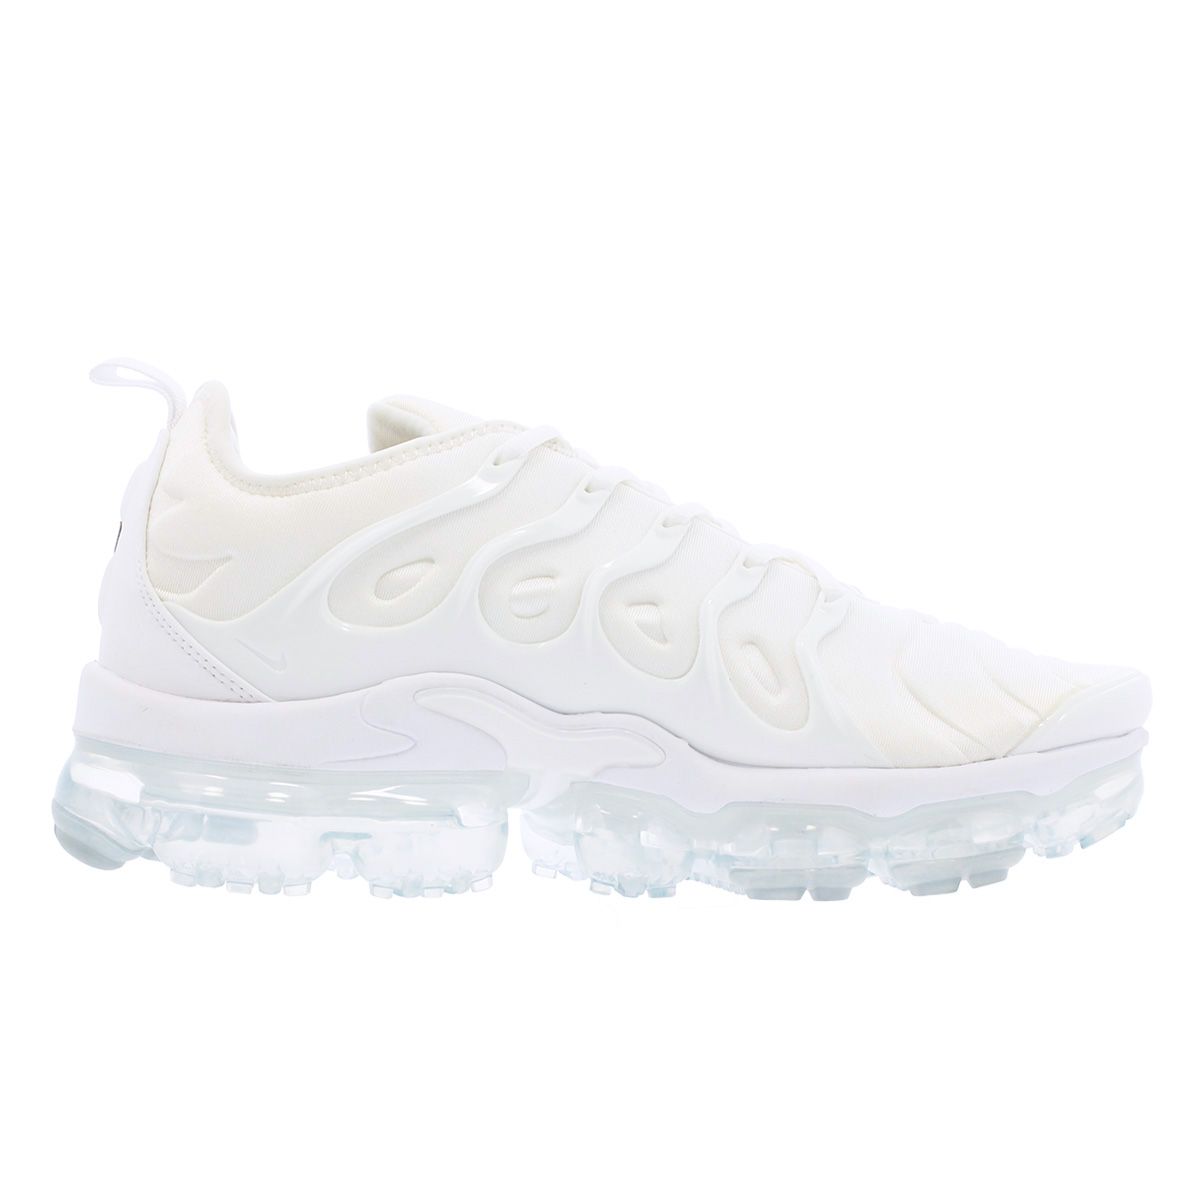 SELECT SHOP LOWTEX  NIKE AIR VAPORMAX PLUS Nike vapor max plus WHITE ... cdb23e19a